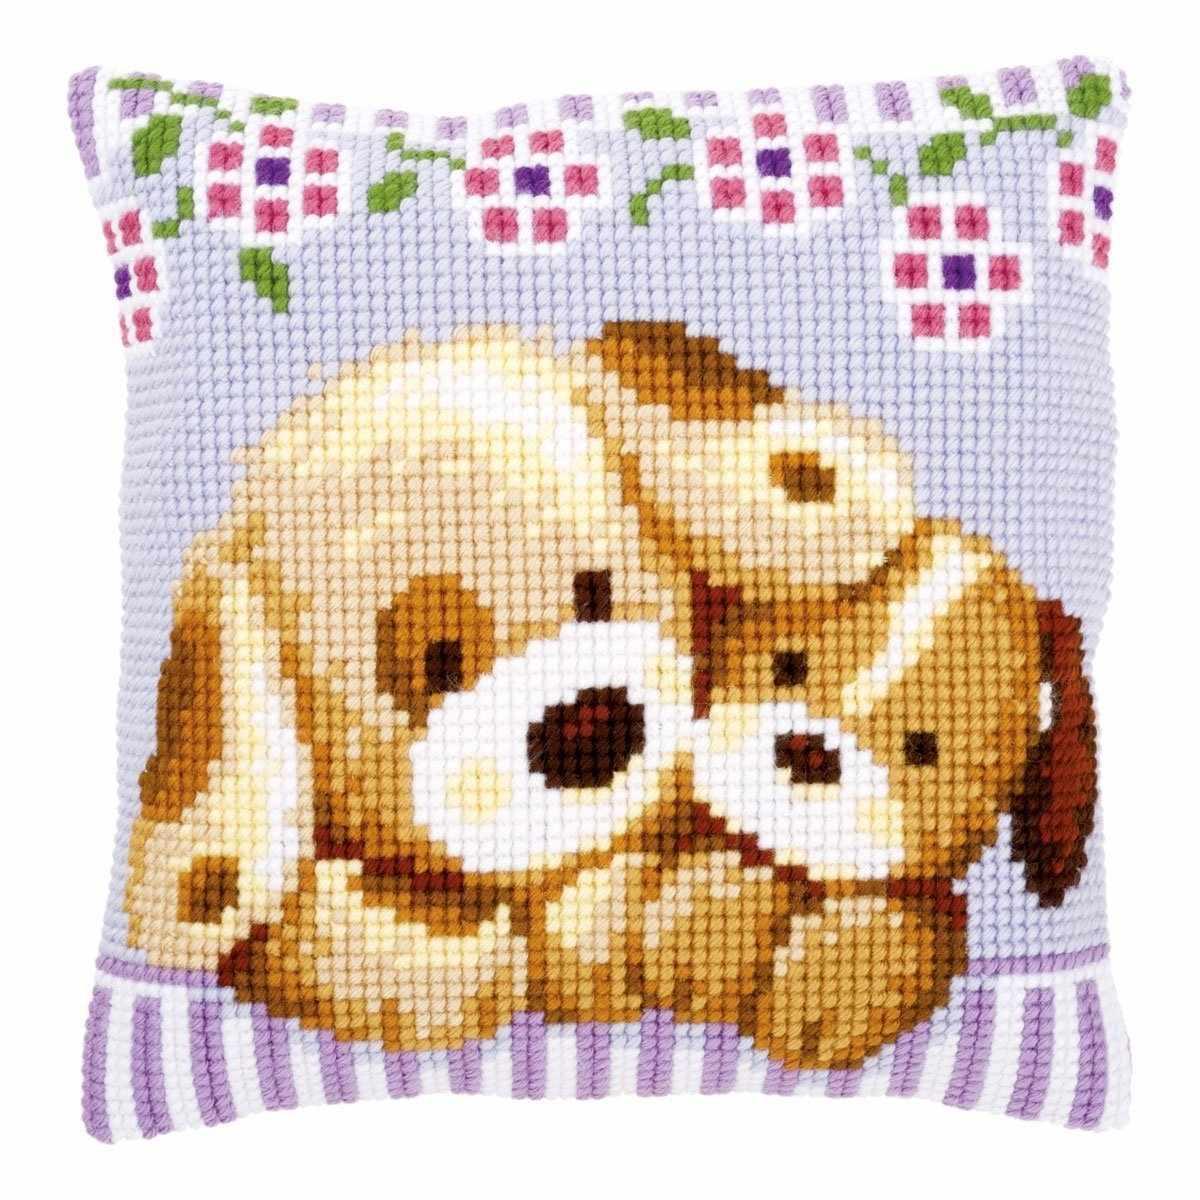 PN-0153903 Cuddling Dogs (Vervaco)